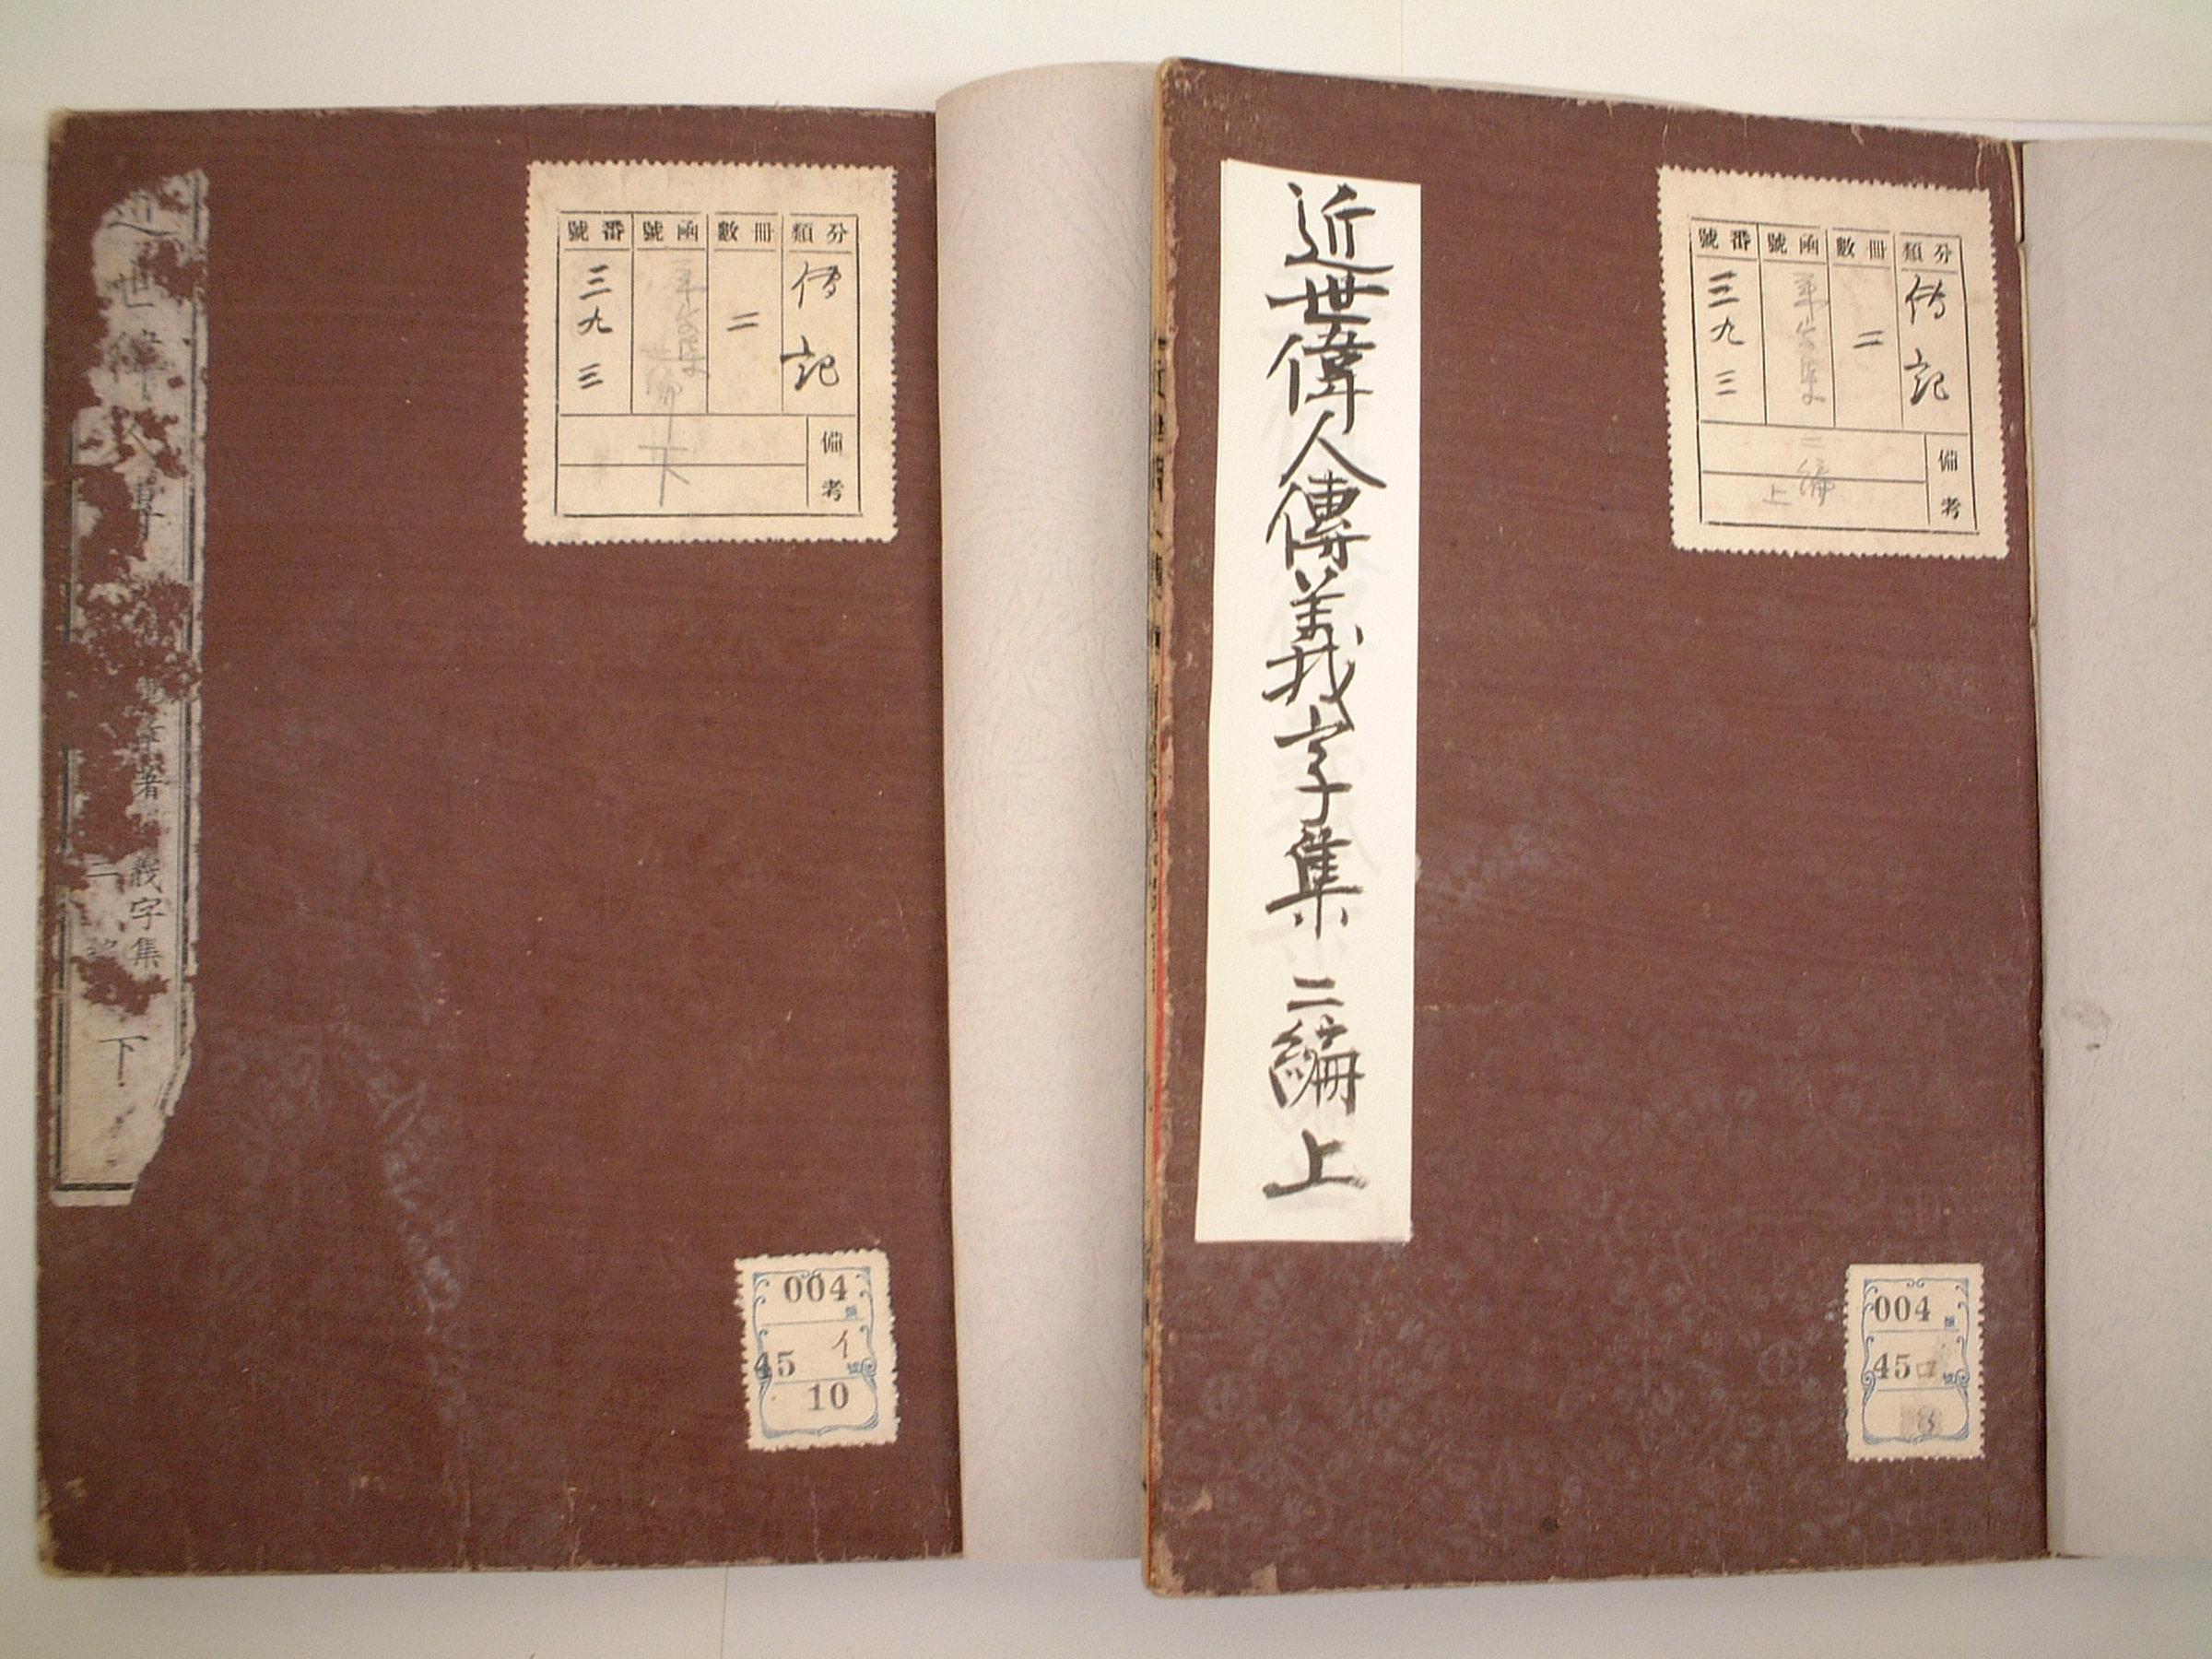 近代書誌・近代画像データベース近世偉人伝義字集 二編